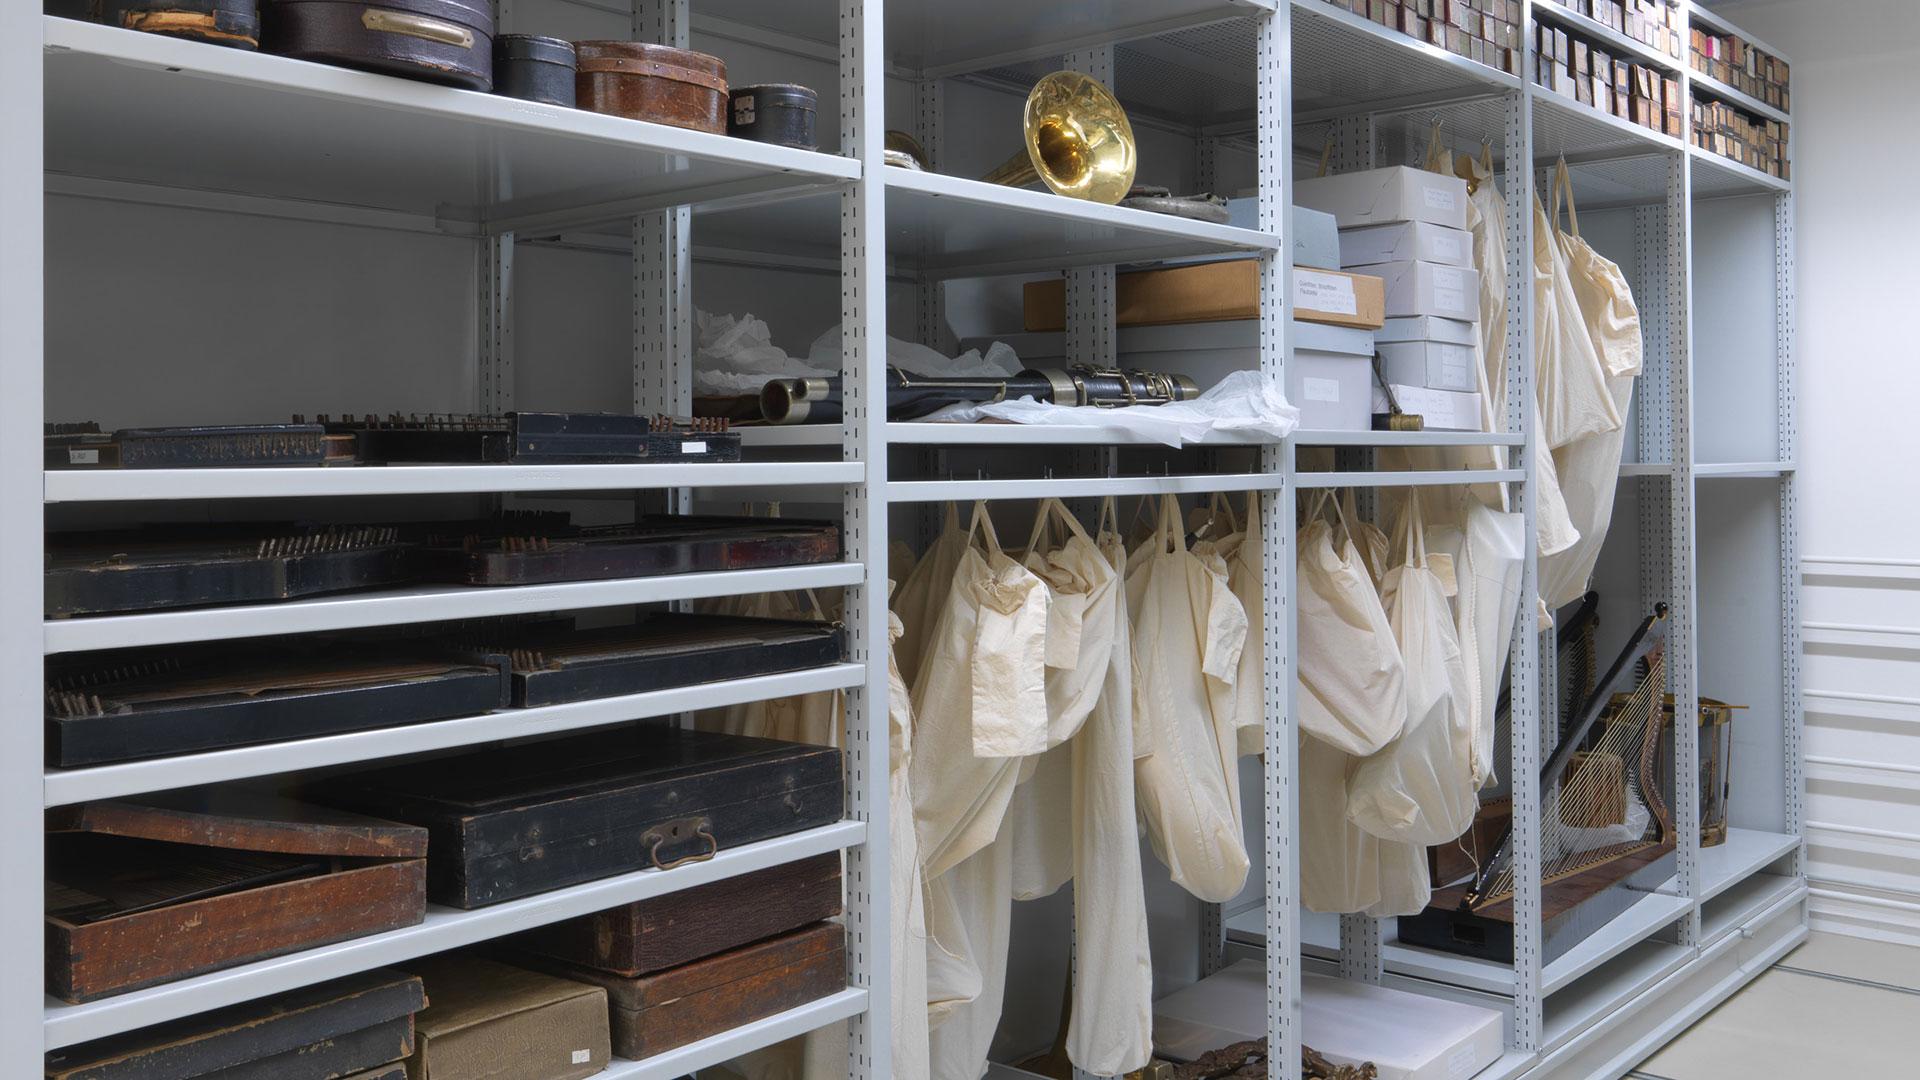 Regalsysteme-Archivregal-Rollregal-Objektloesung-Museumsdepot-RR409-mauser-16-9